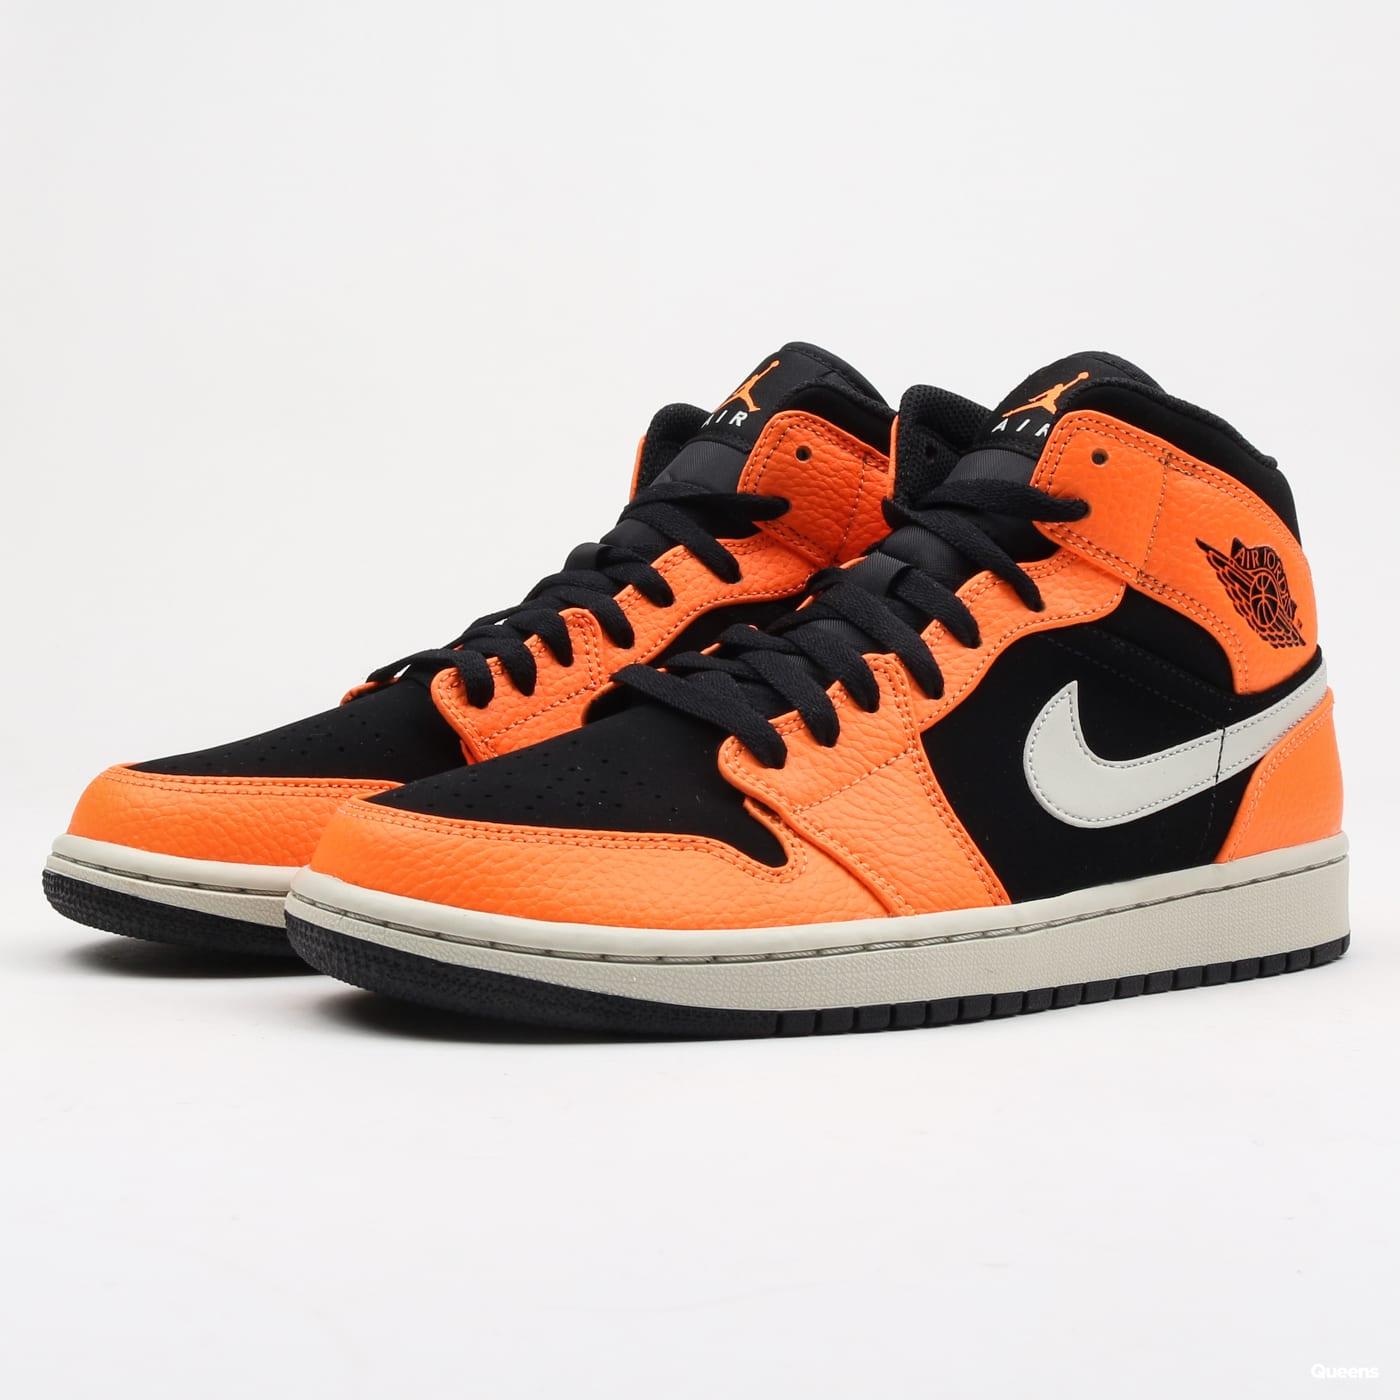 buy popular 95000 0a0a6 Sneakers Jordan Air Jordan 1 Mid (554724-062)– Queens 💚